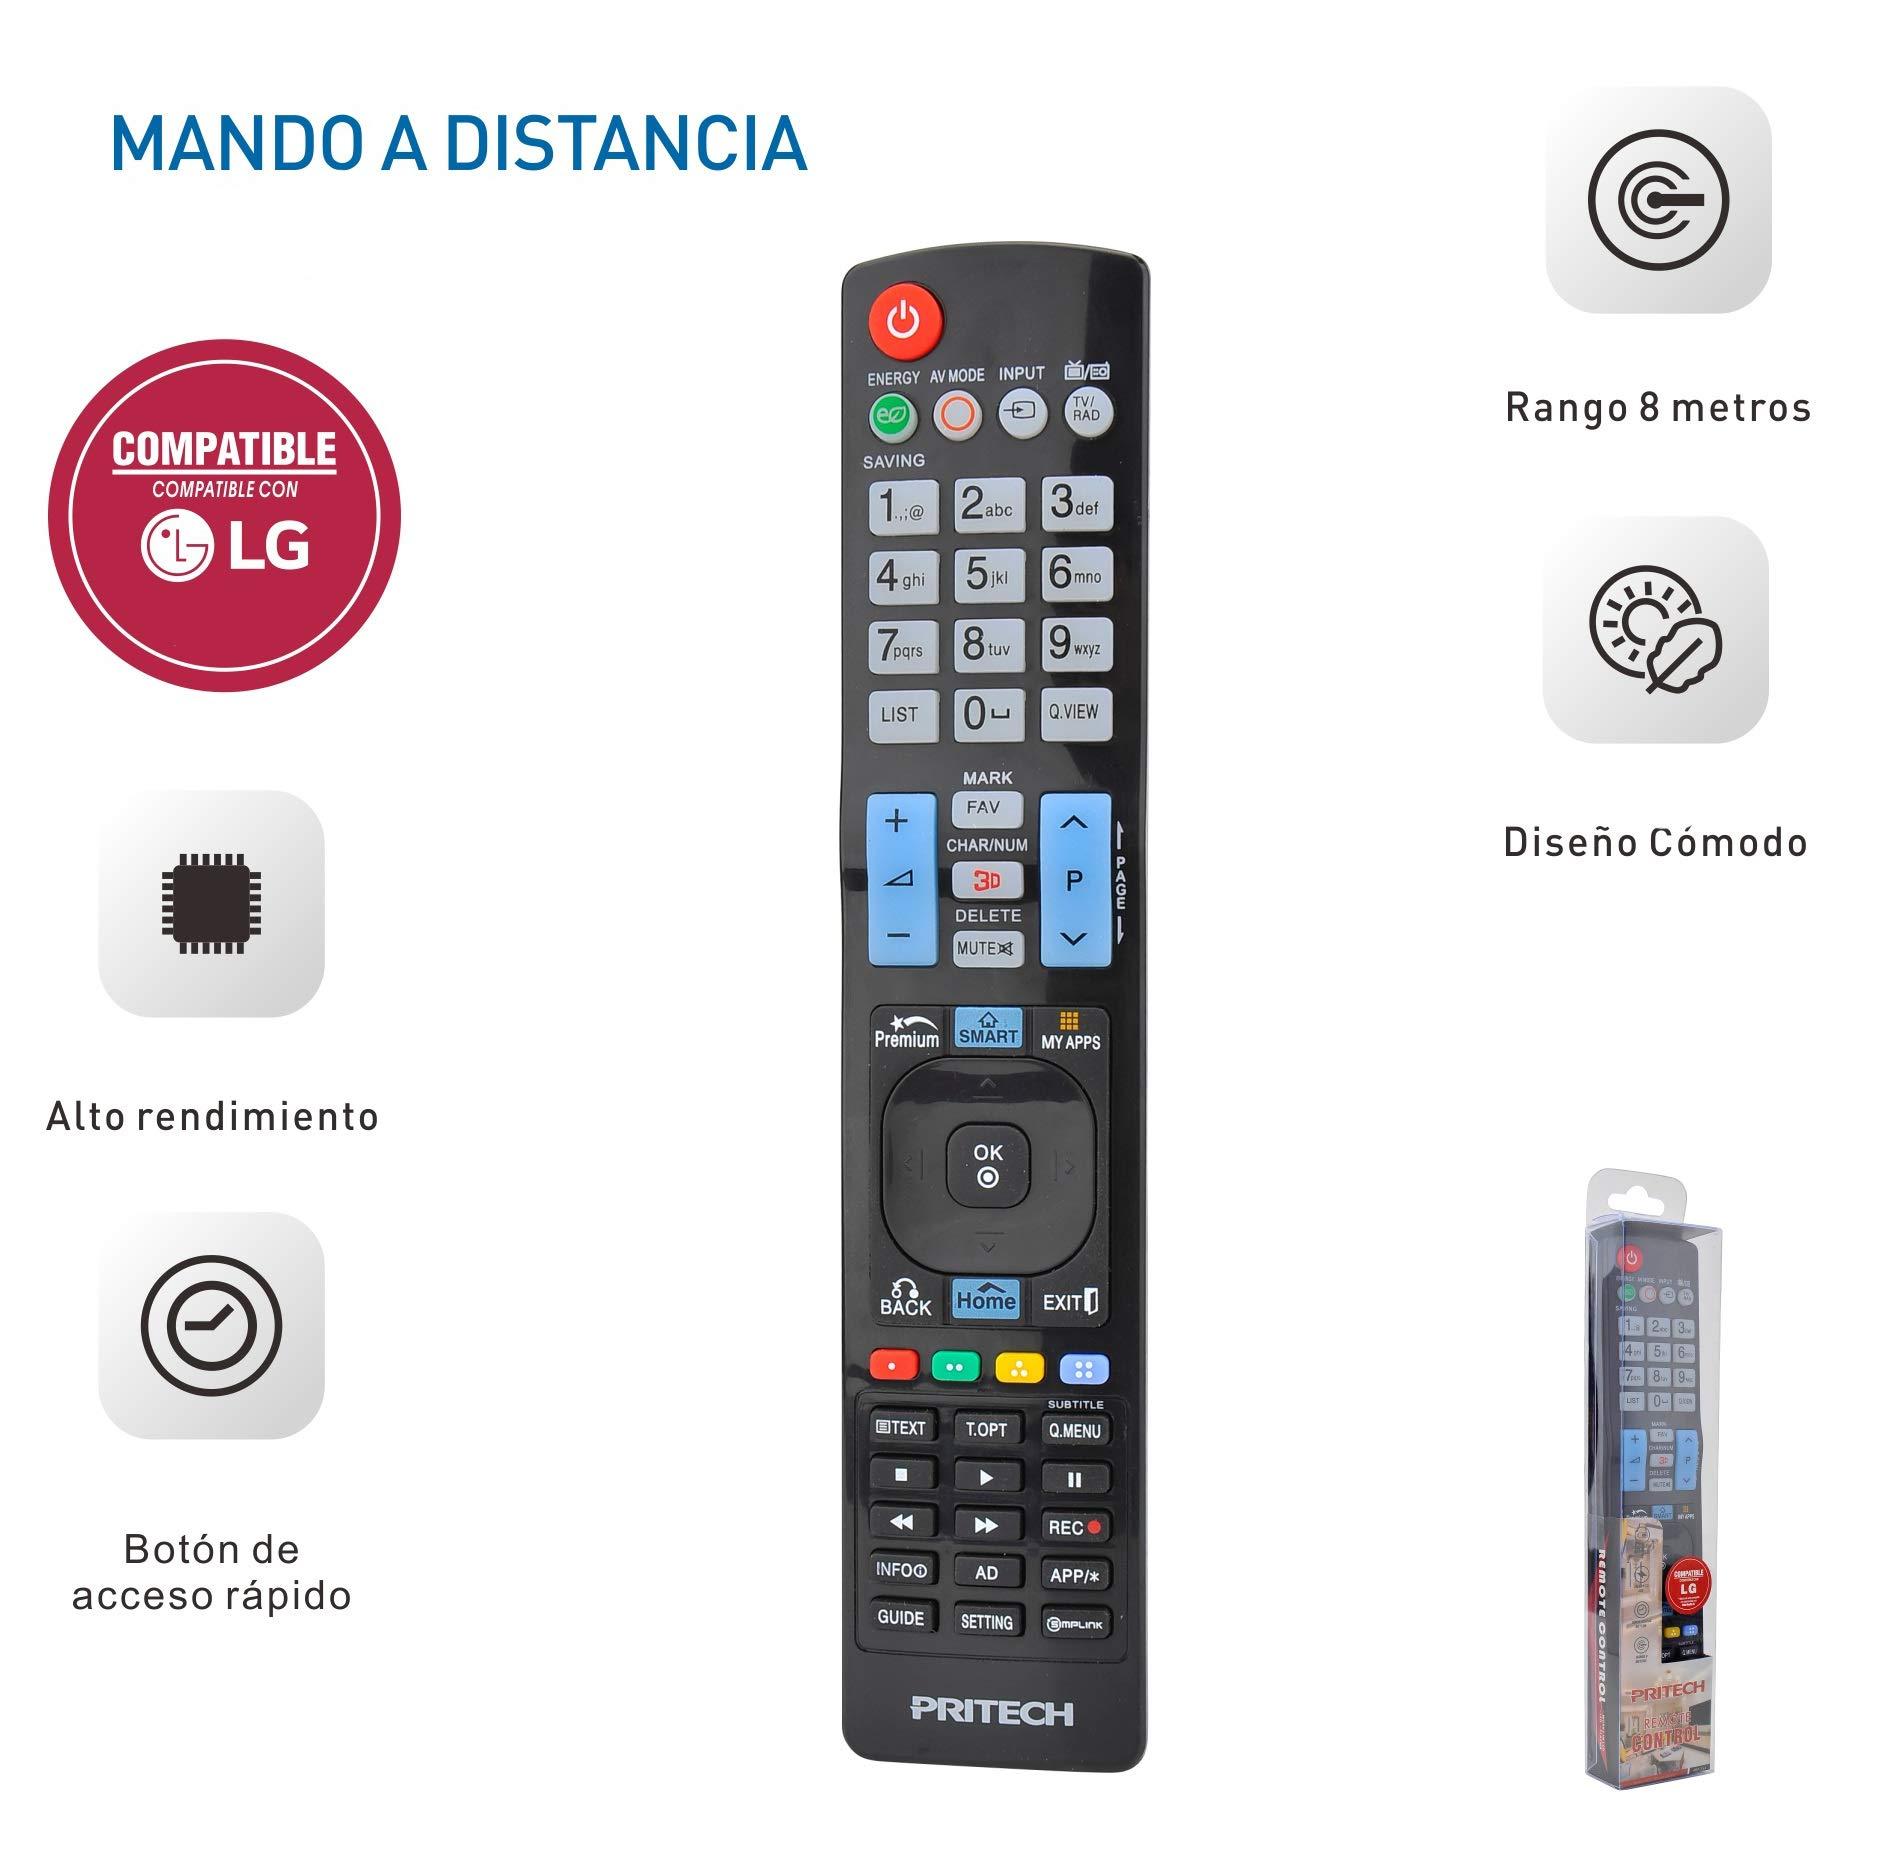 Pritech - Mando a Distancia Universal para Televisores: Amazon.es ...